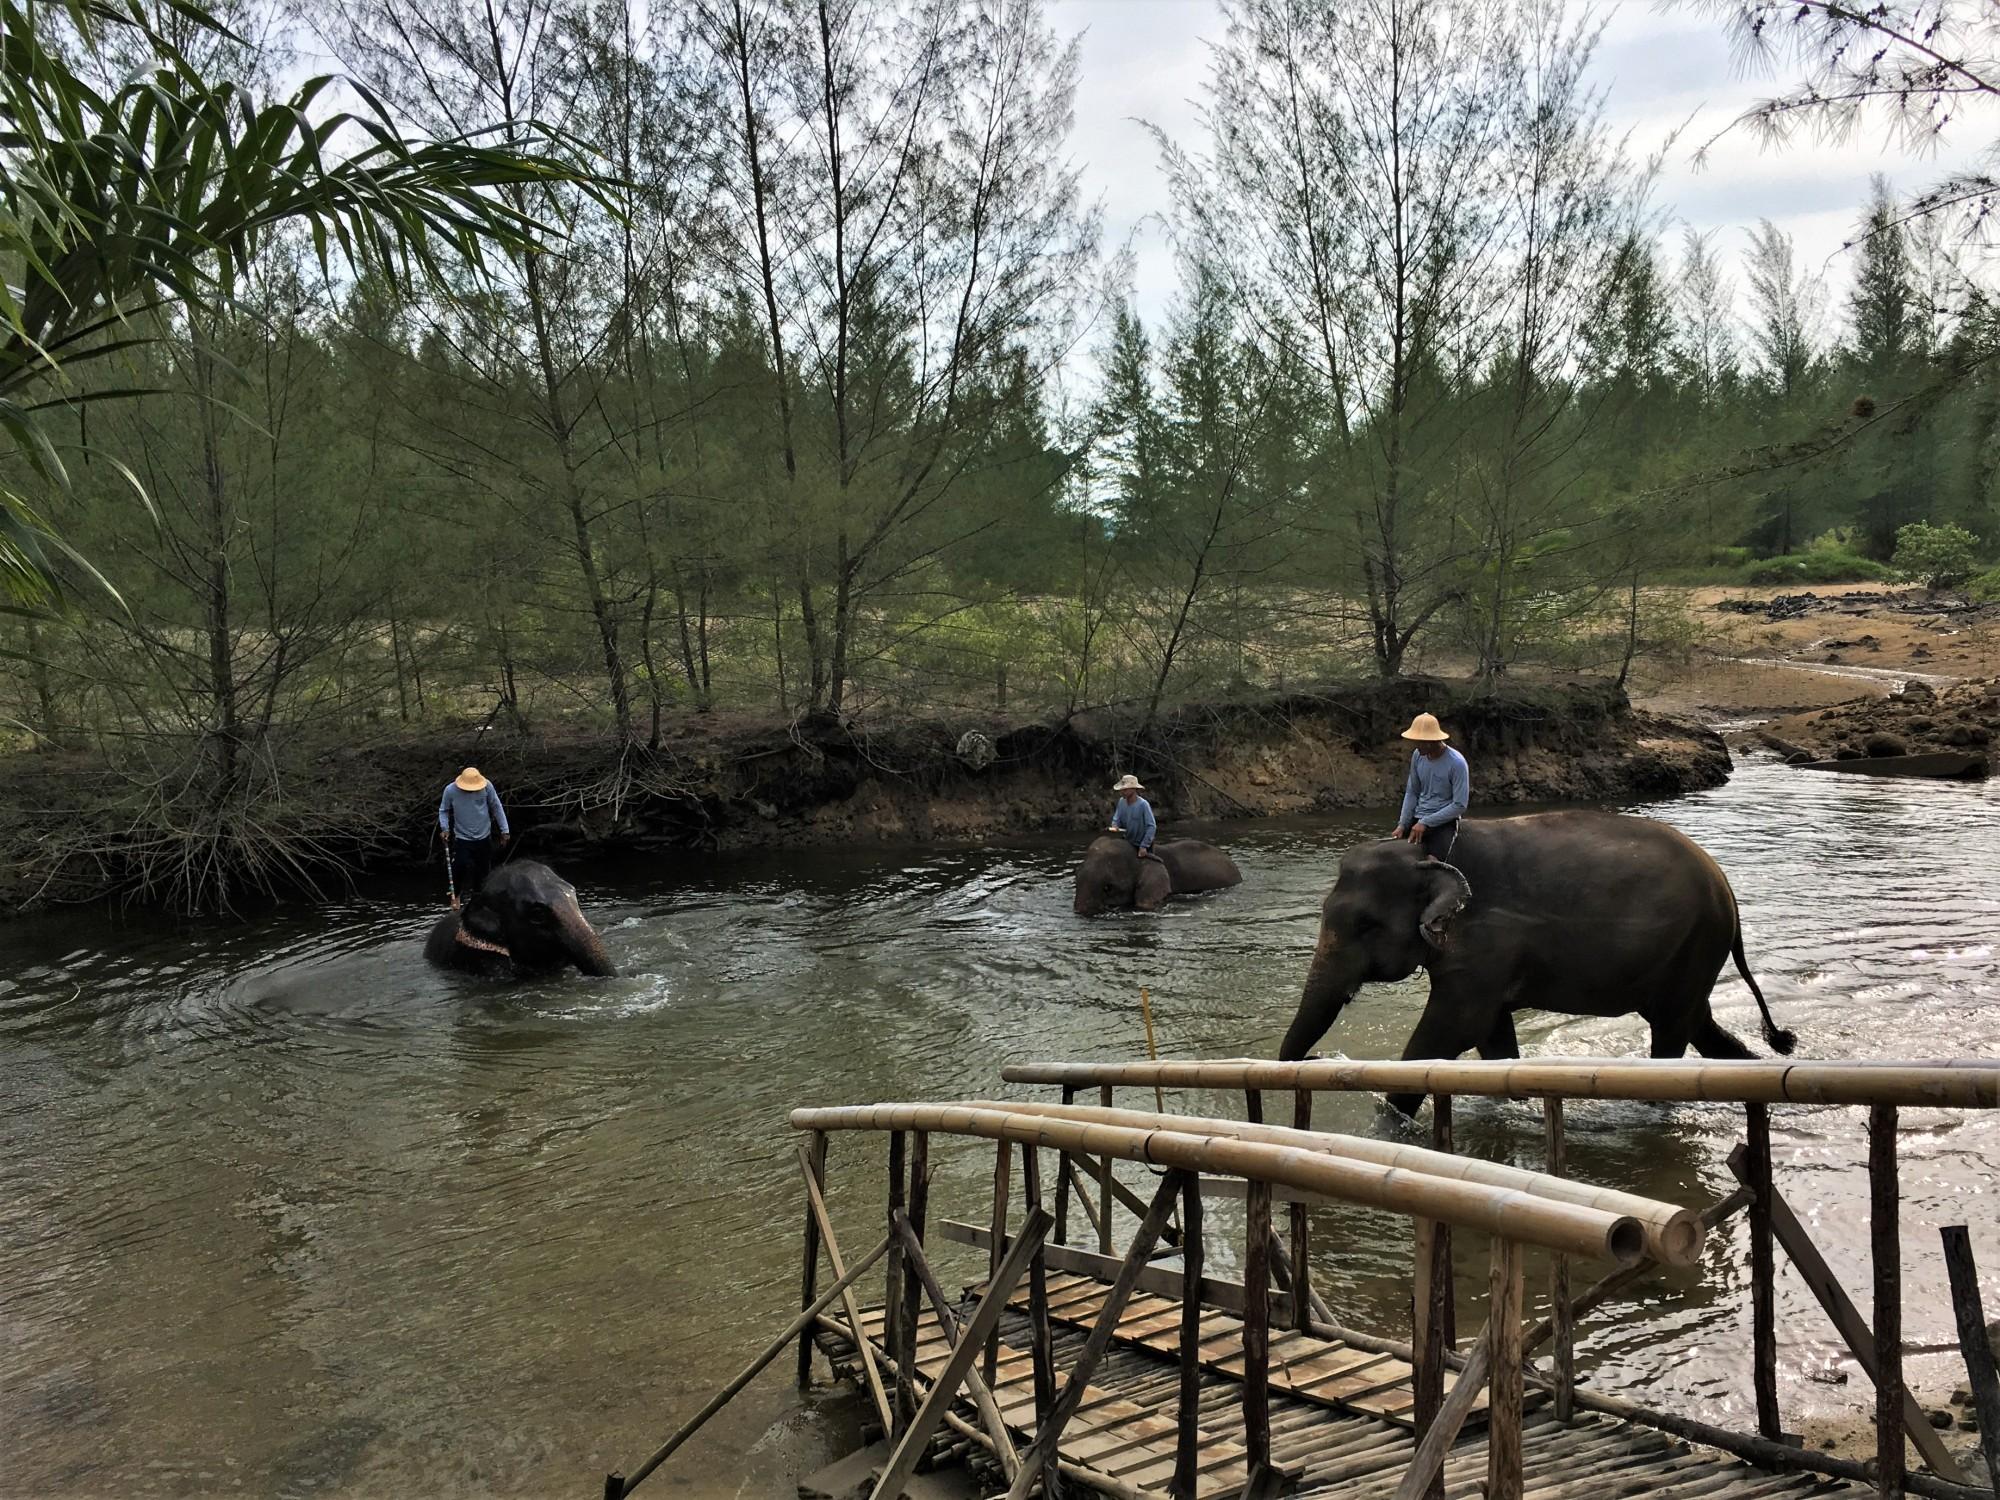 The Seaside Retreat Elephants in the river, Khao Lak, Thailand